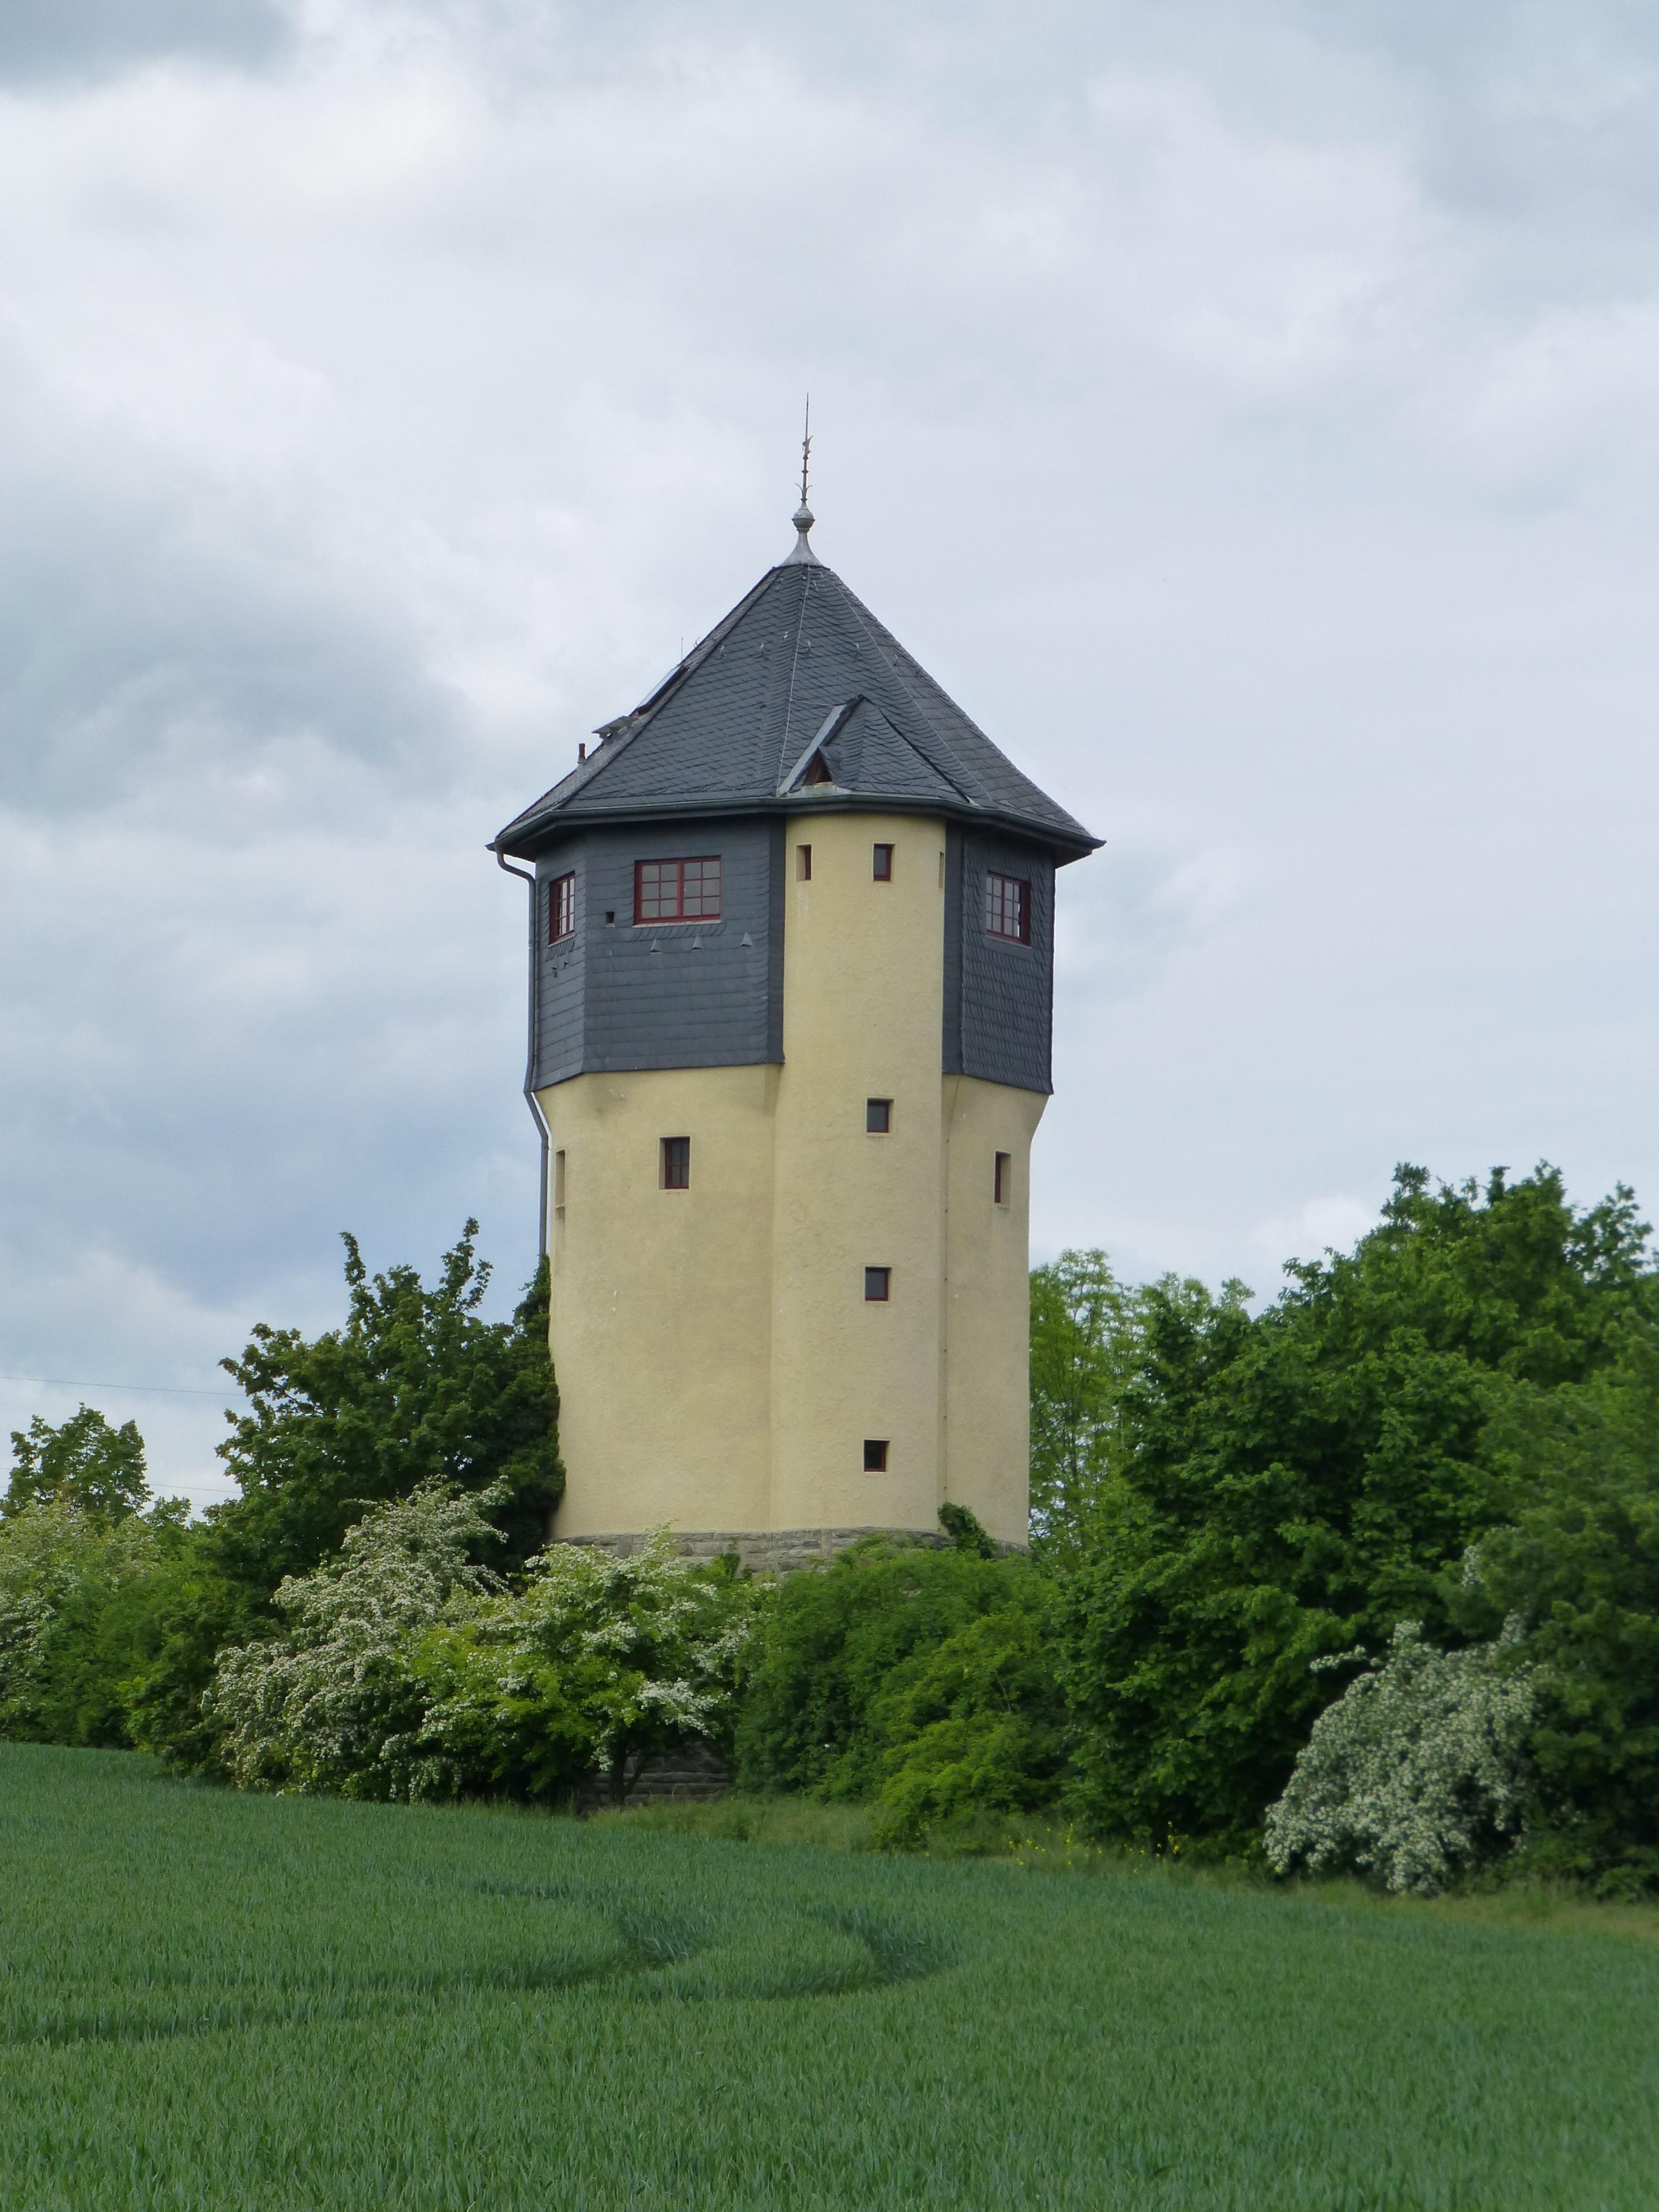 Bad Soden am Taunus, Hessen, Germany